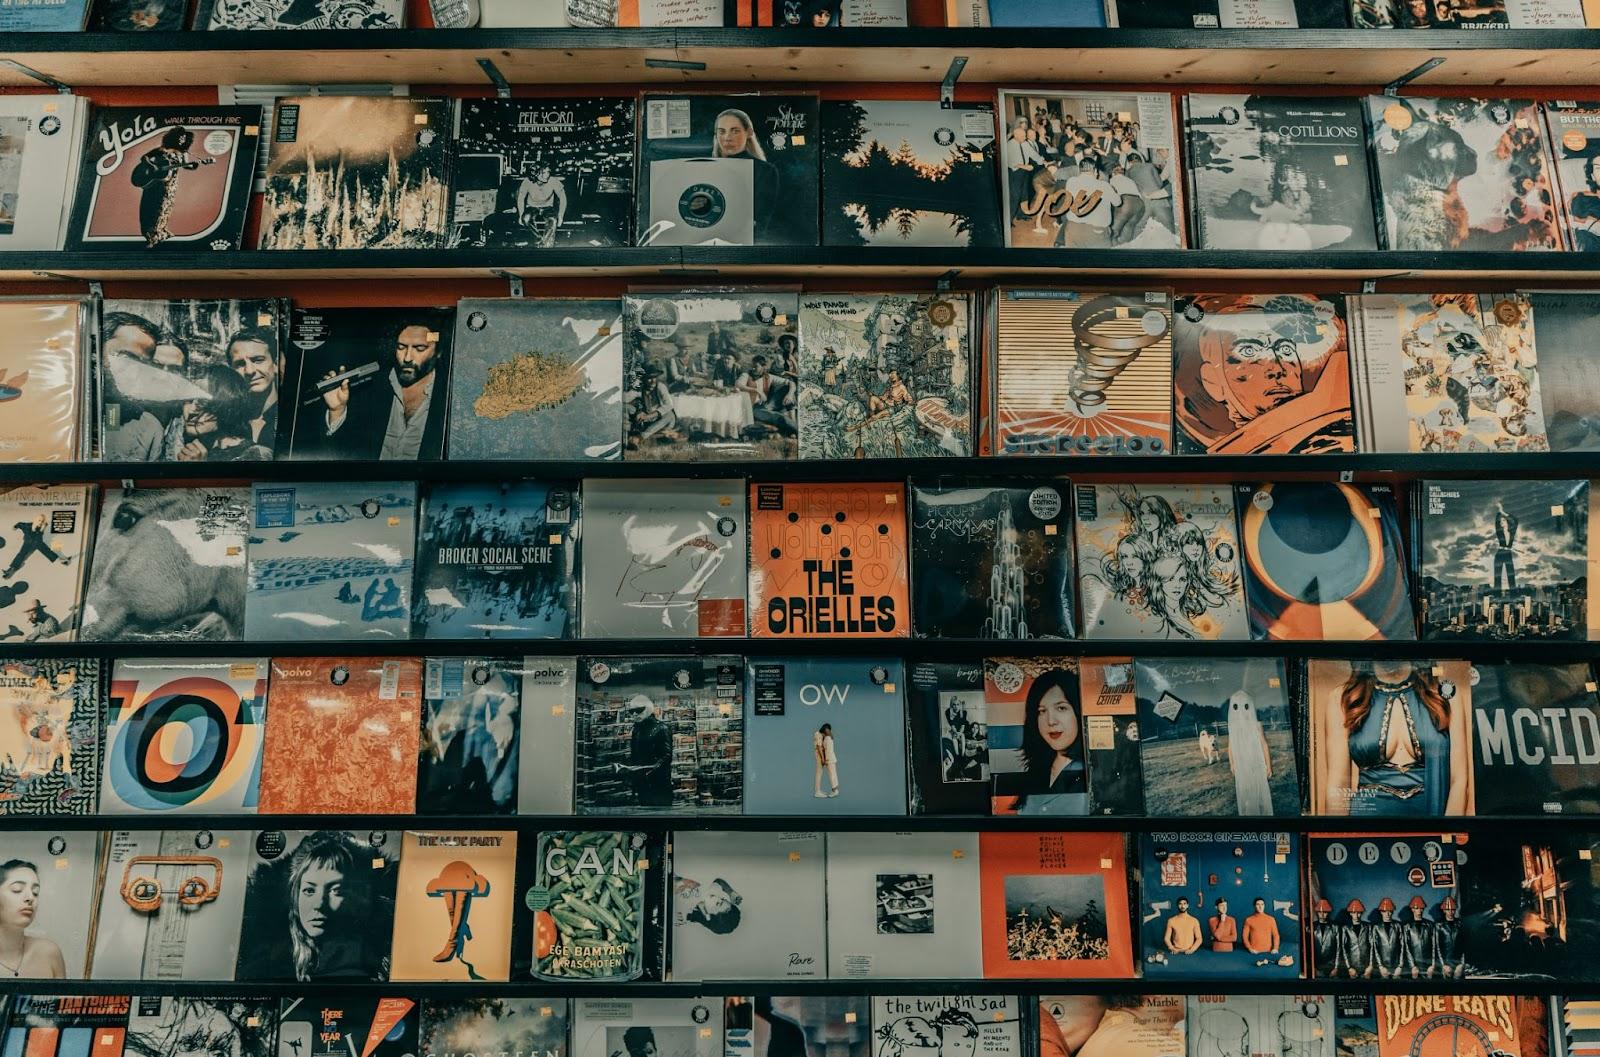 Vintage vinyl album collection